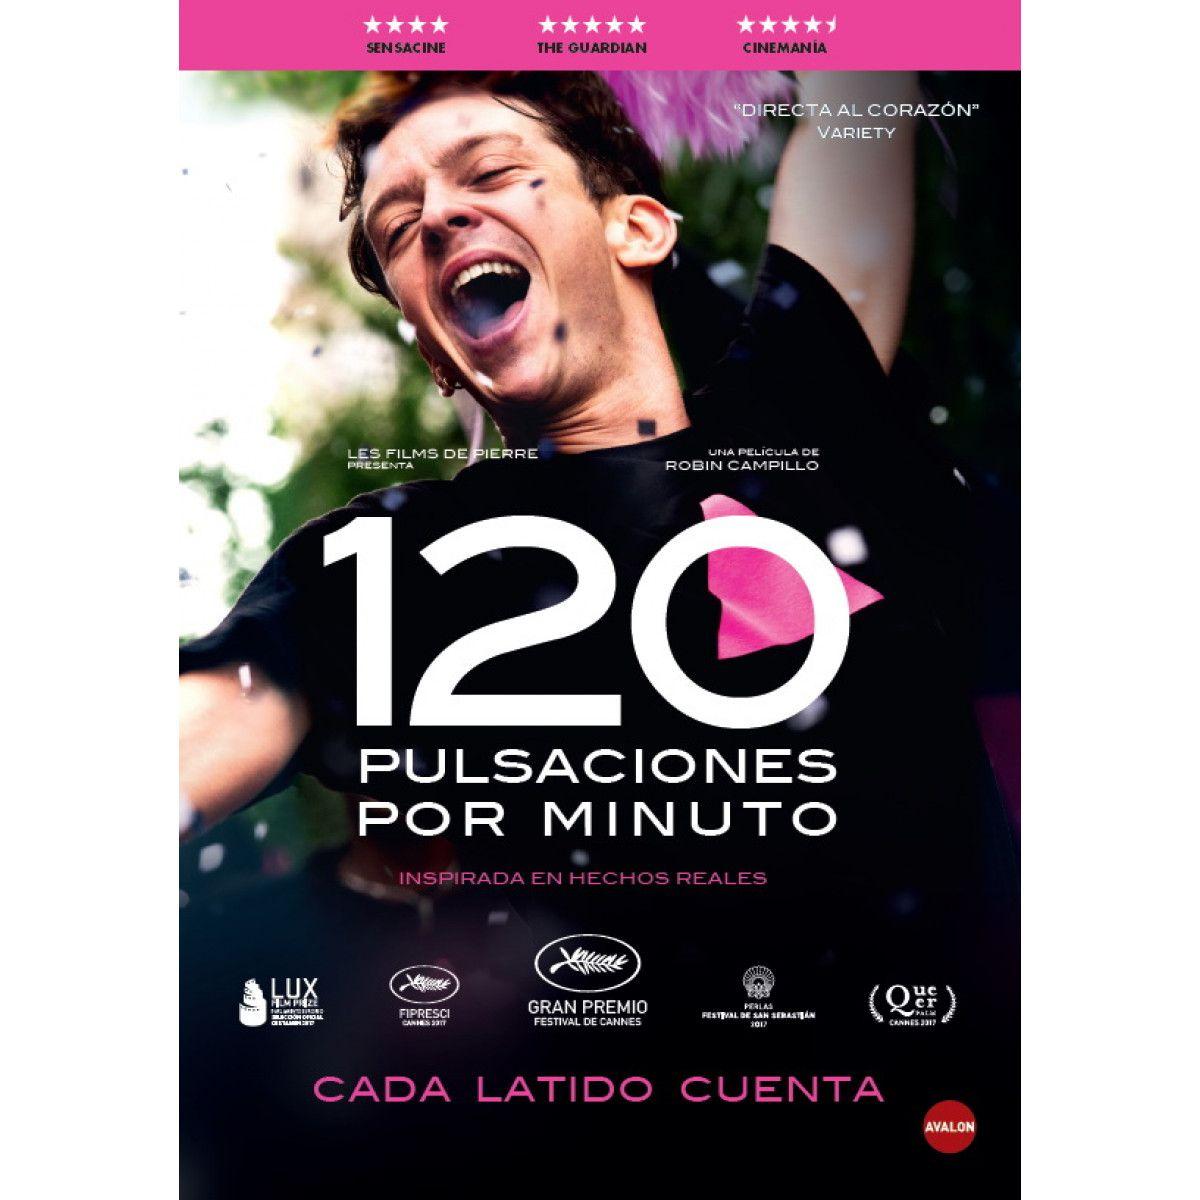 120 Pulsaciones Por Minuto Localizacion Kokagunea Audiovisuales Planta 0 Behe Solairua Ikus Entzunezk Full Movies Online Free About Me Blog Informative